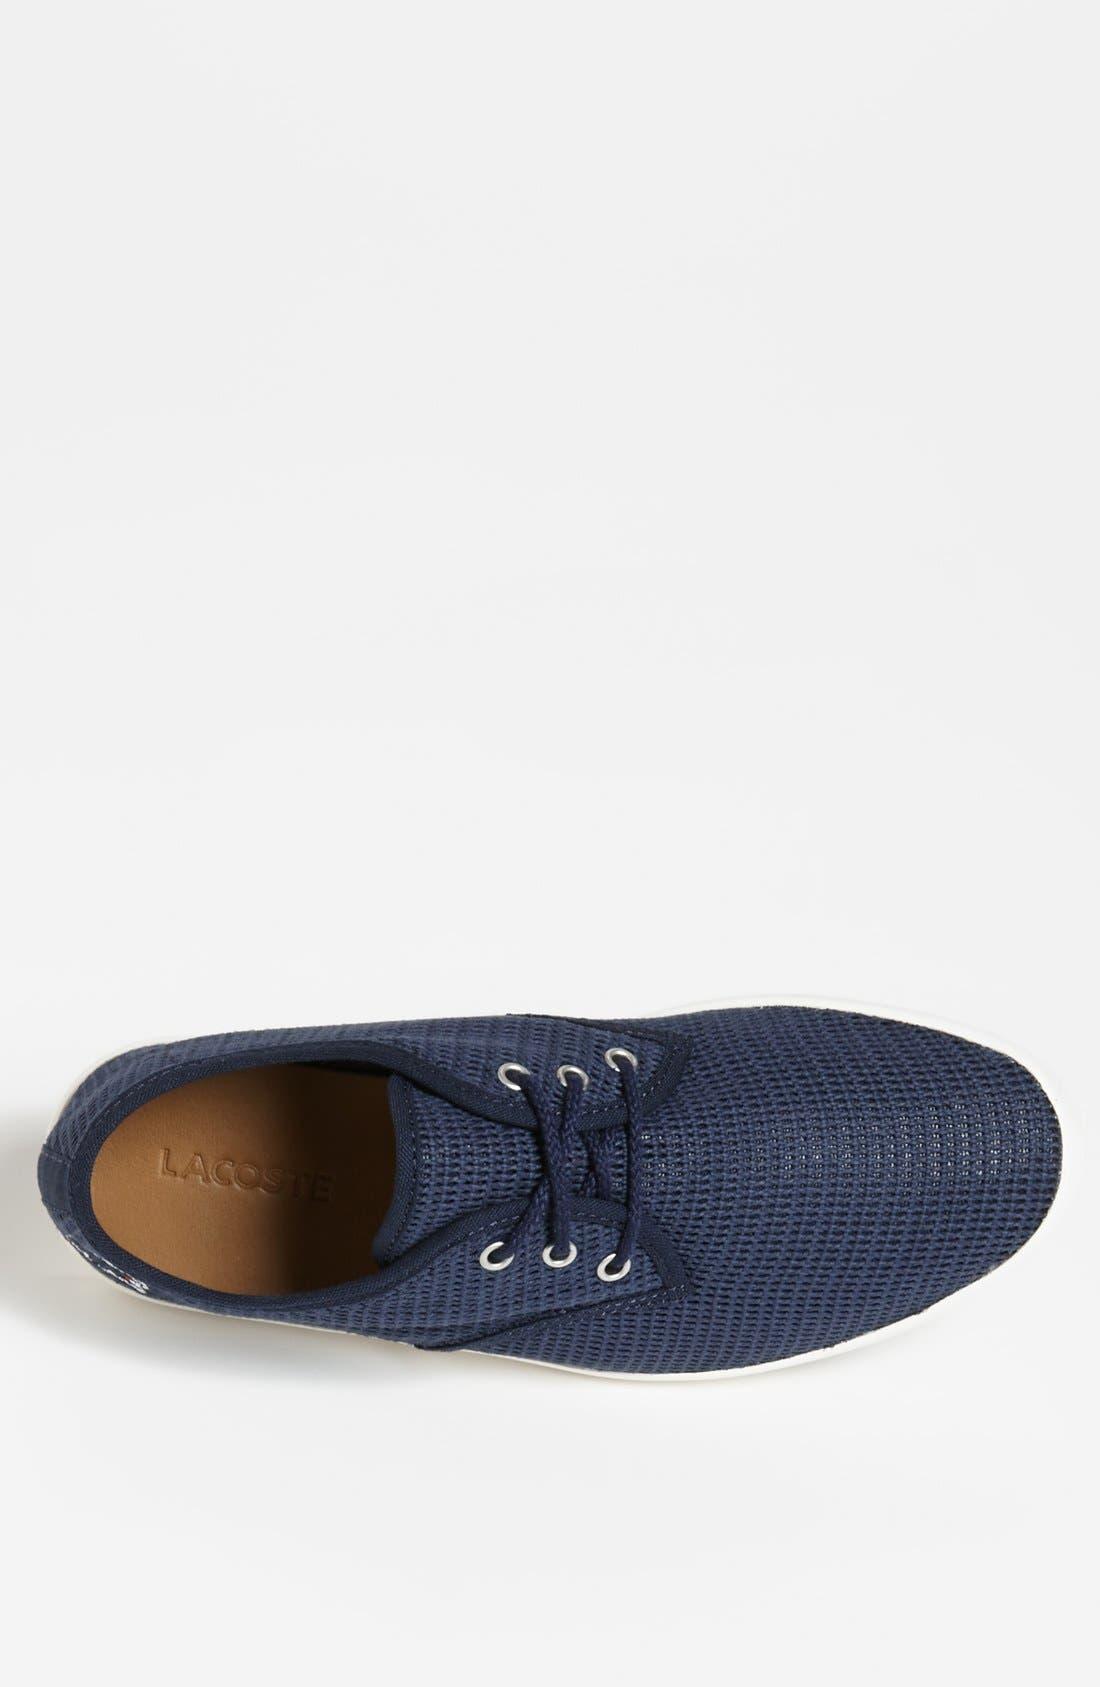 Alternate Image 3  - Lacoste 'Aristide 10' Sneaker (Men)